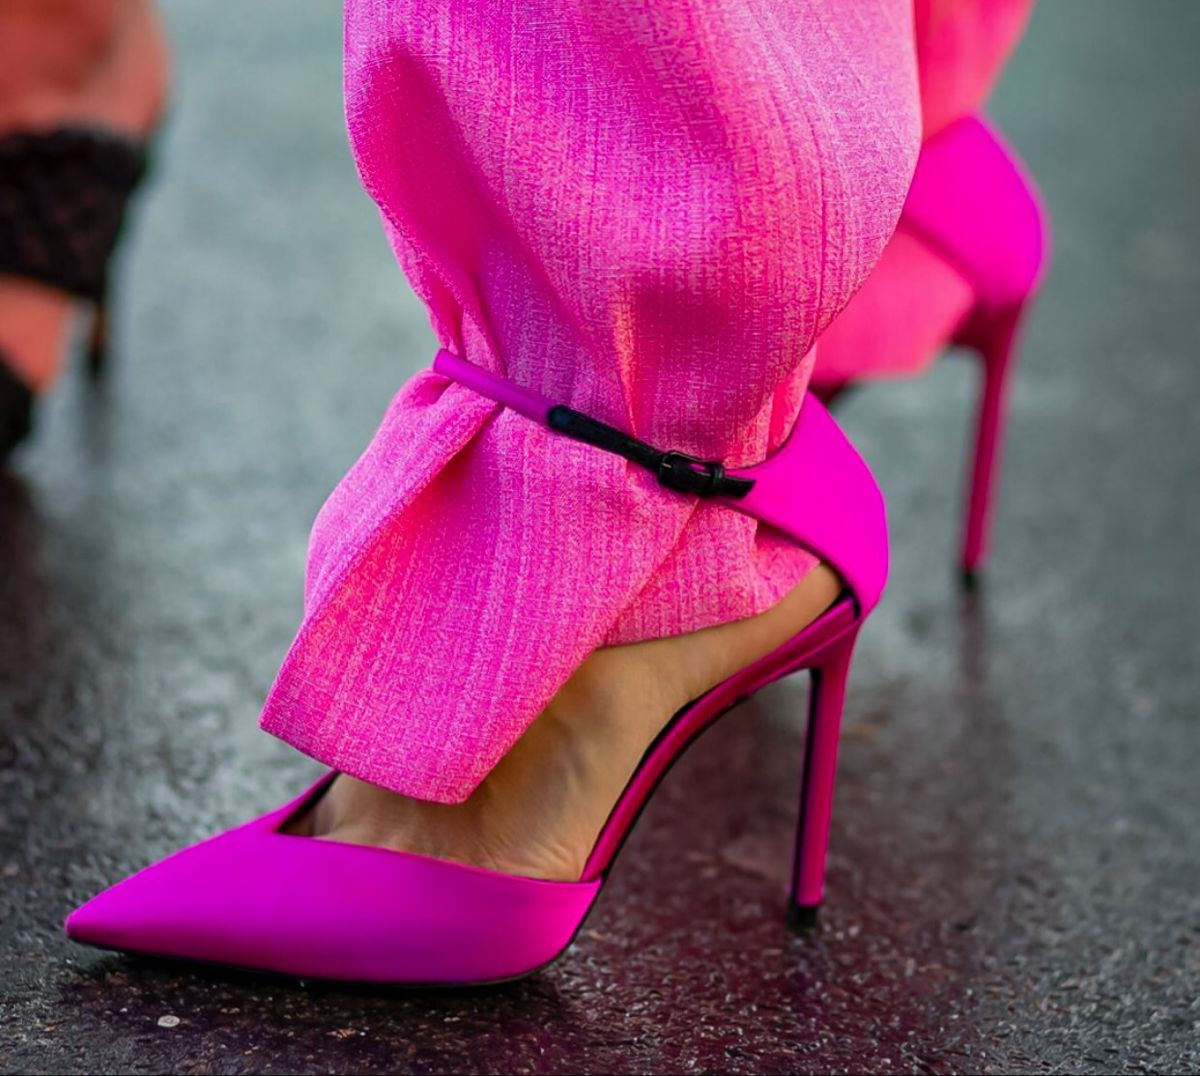 Shoes 💘💘 #pink #heelsaddict